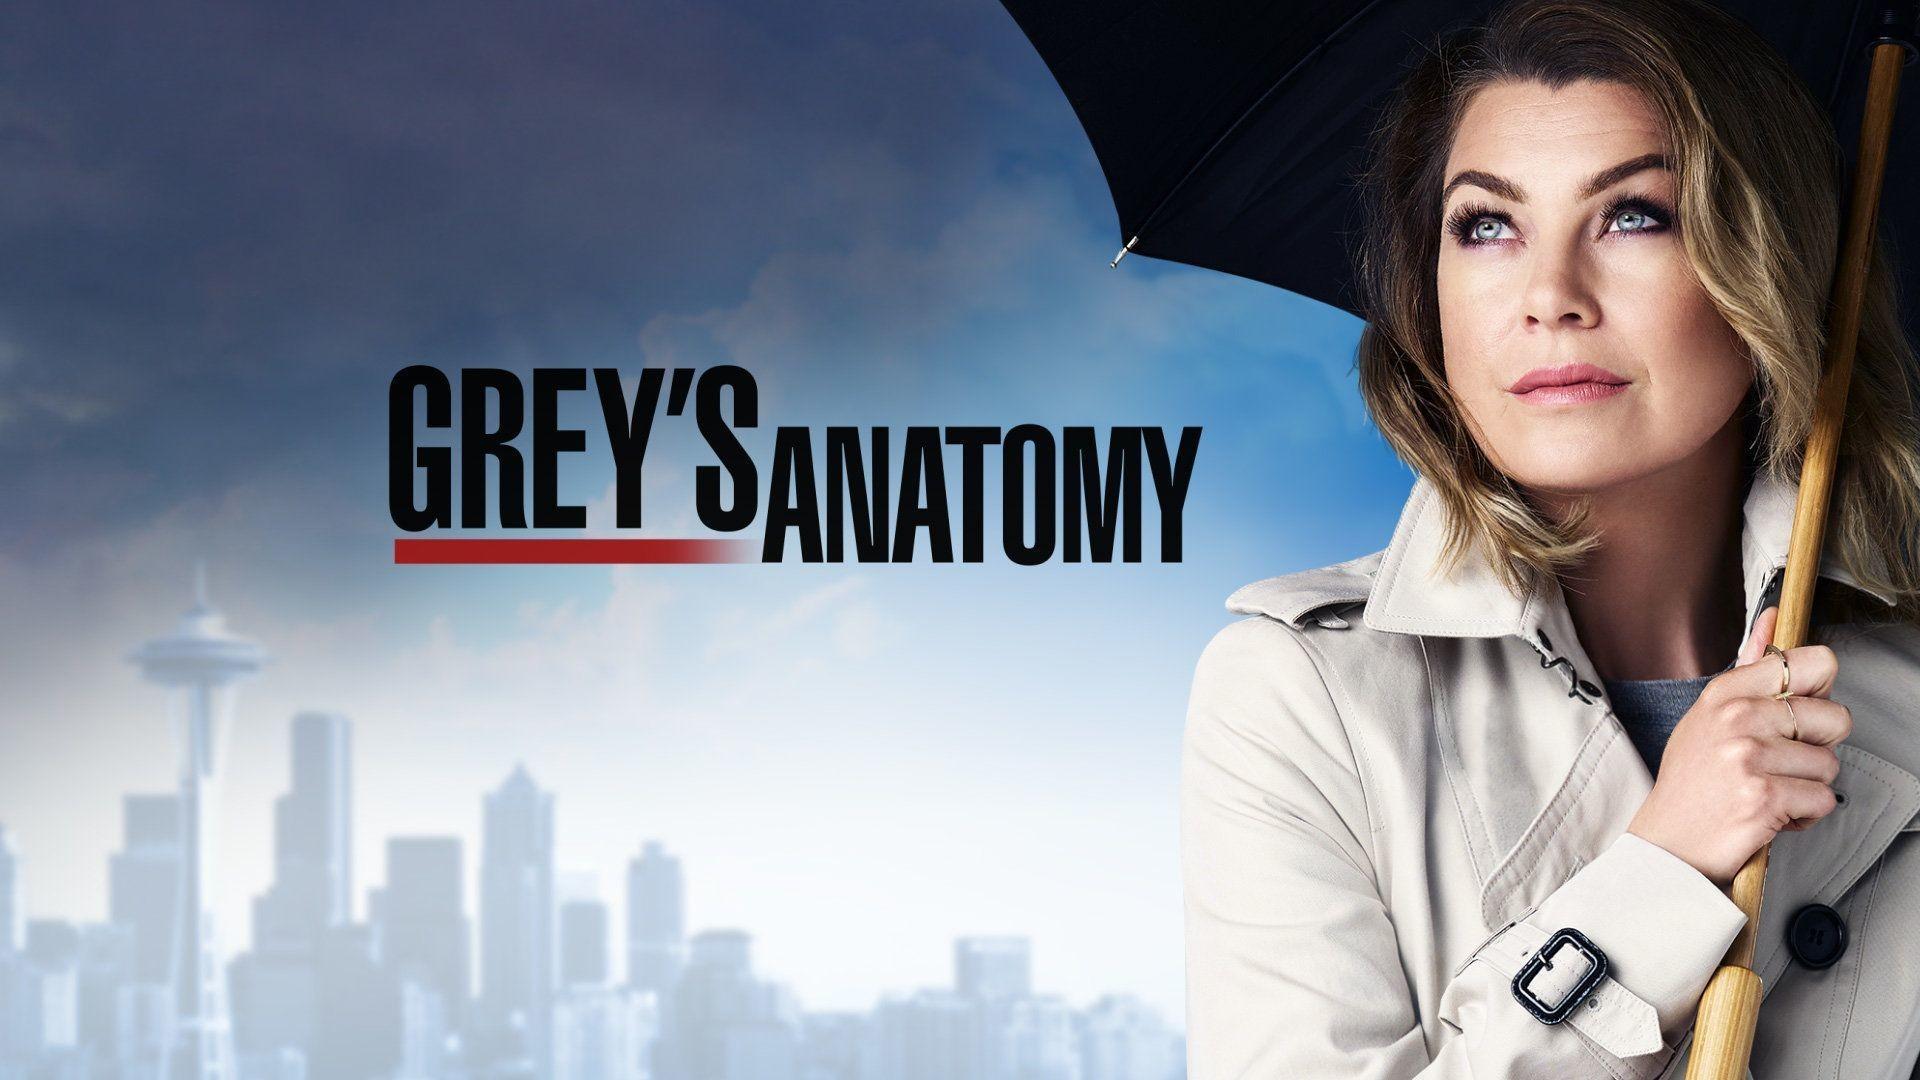 TV Show – Grey's Anatomy Wallpaper